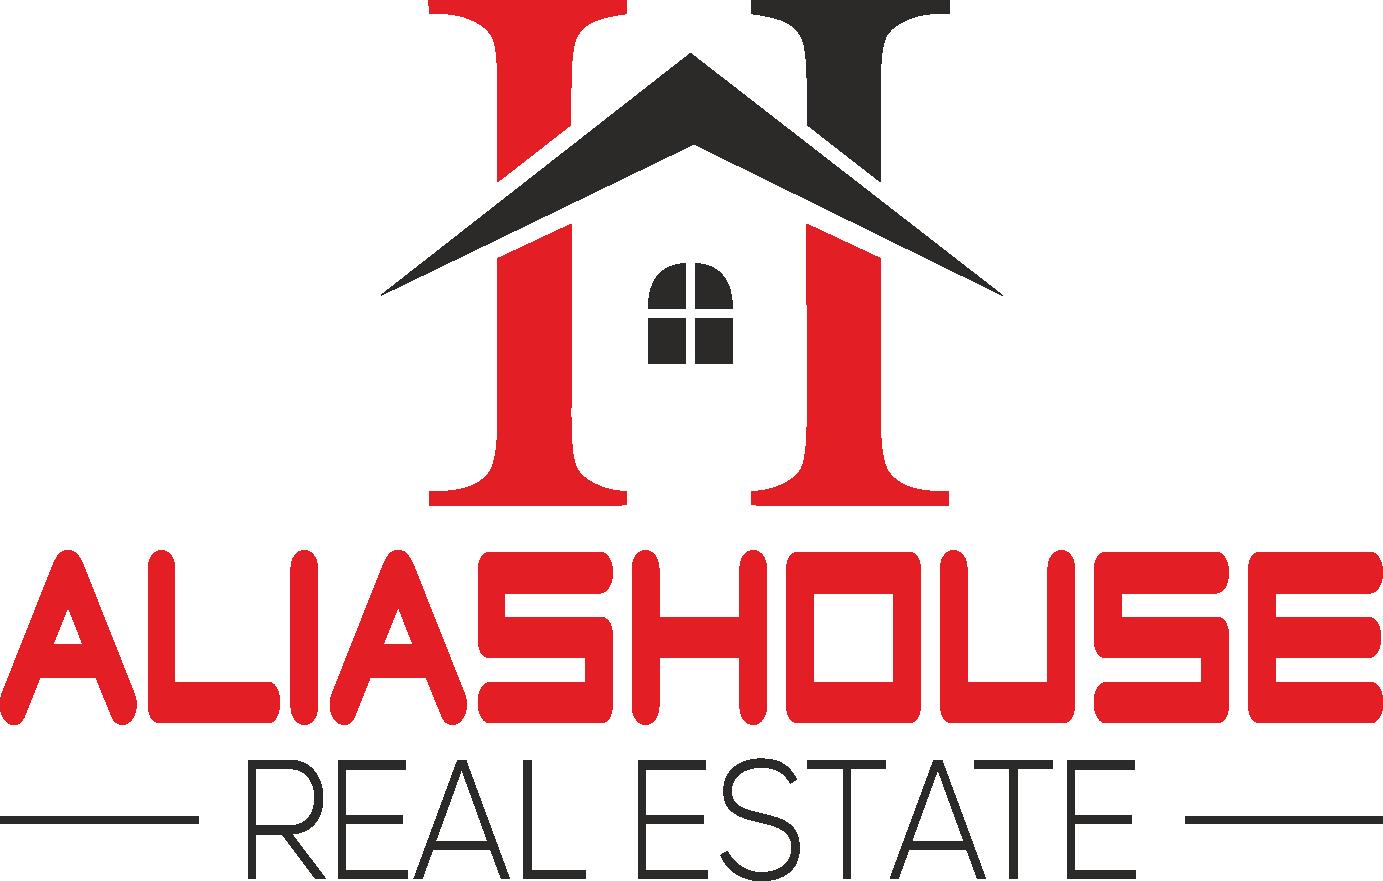 AliasHouse - Real Estate - Agent Contact